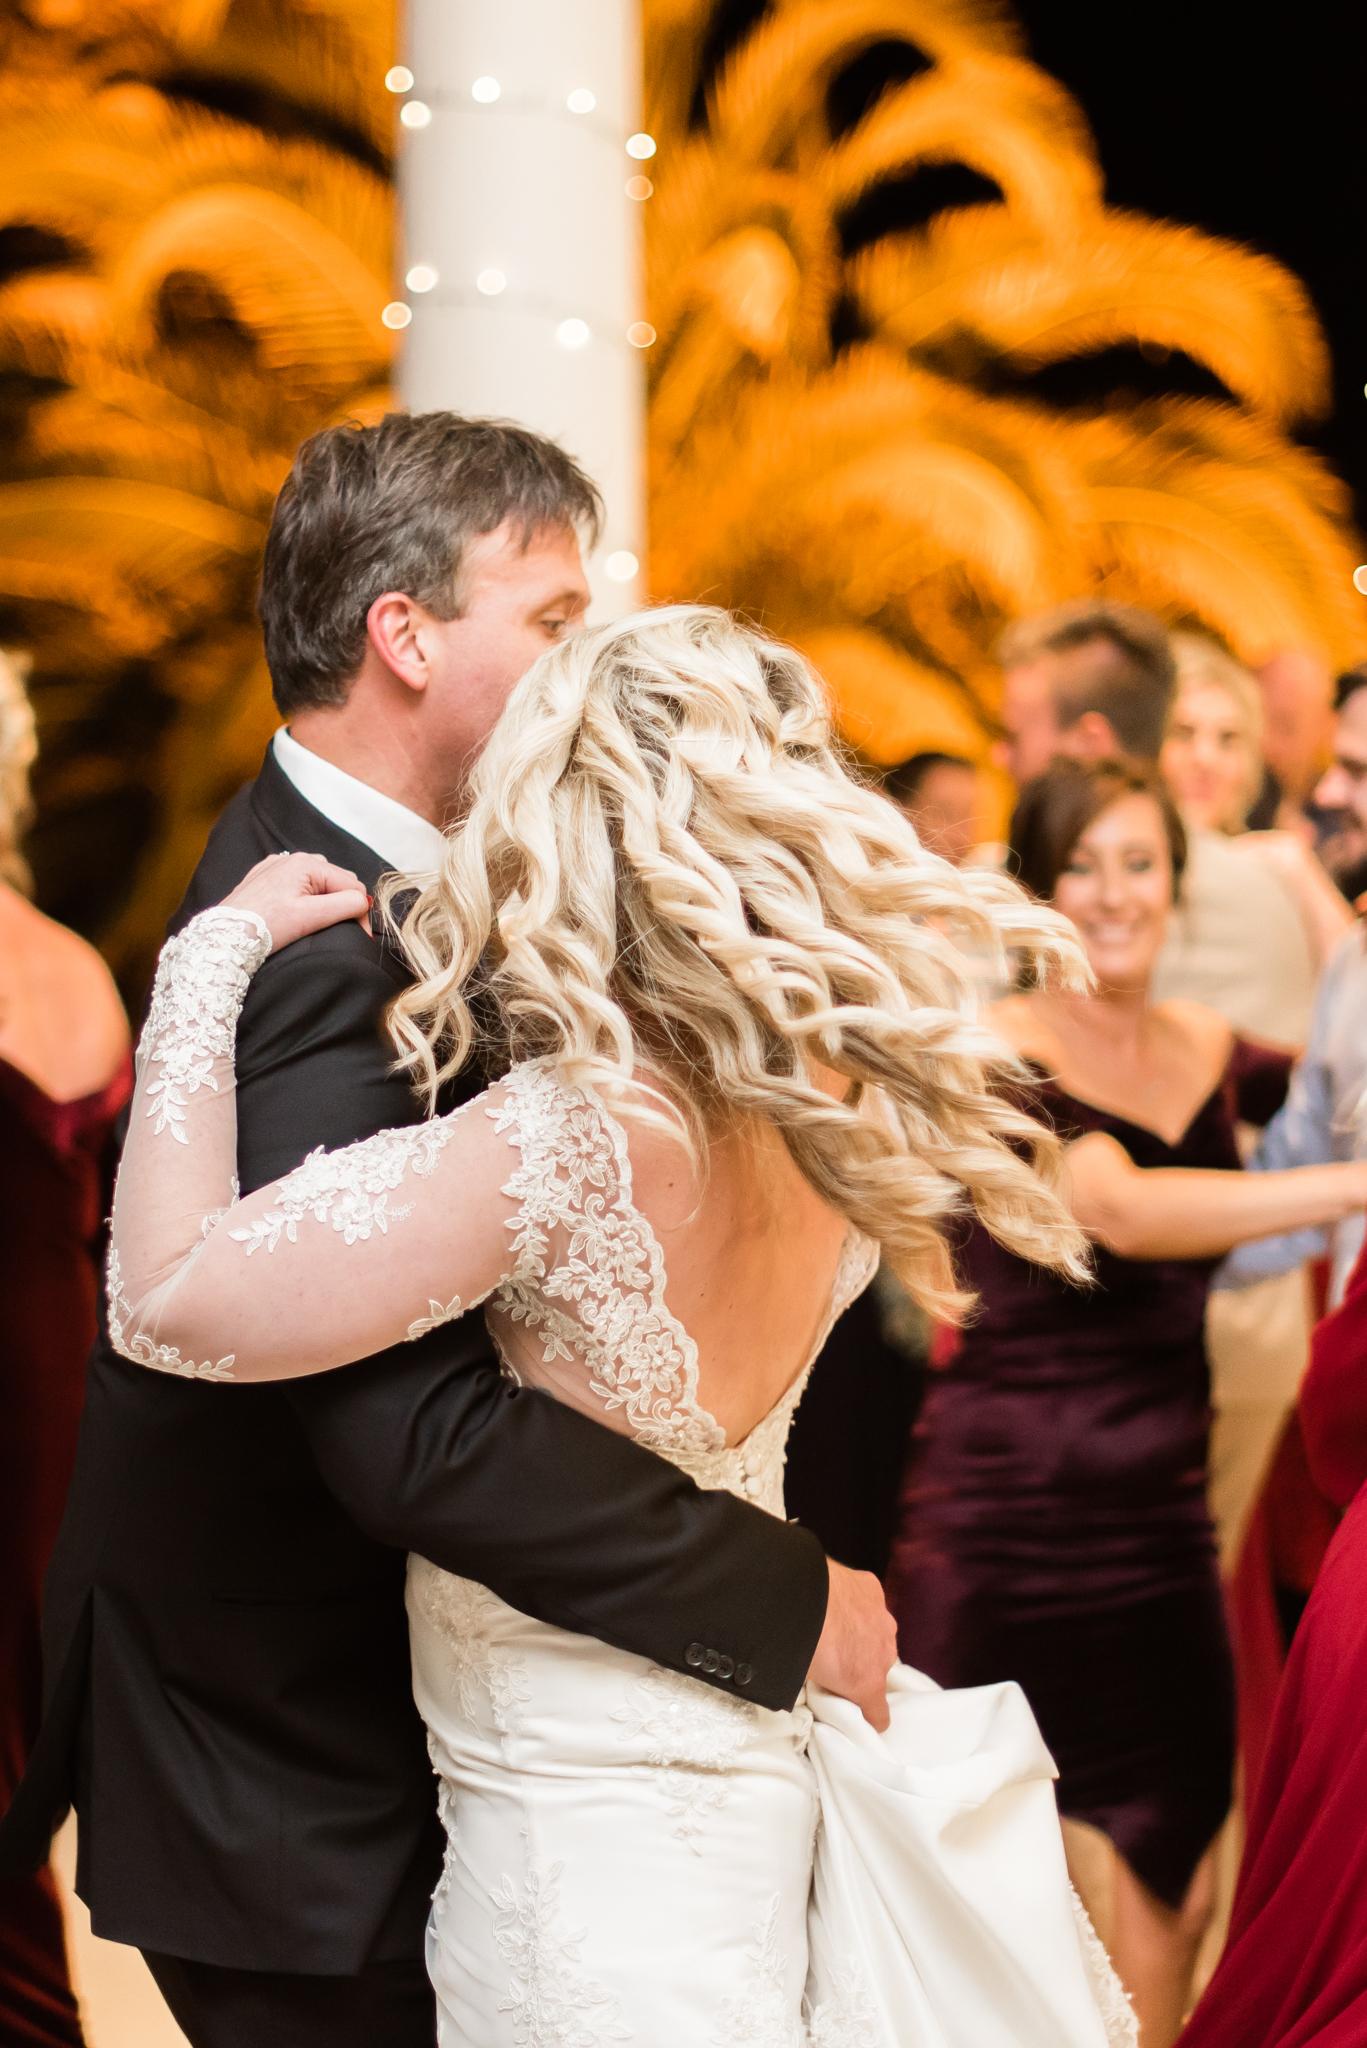 Angelique_Smith_Photography_Pieter&Yvonne_Wedding-544.jpg